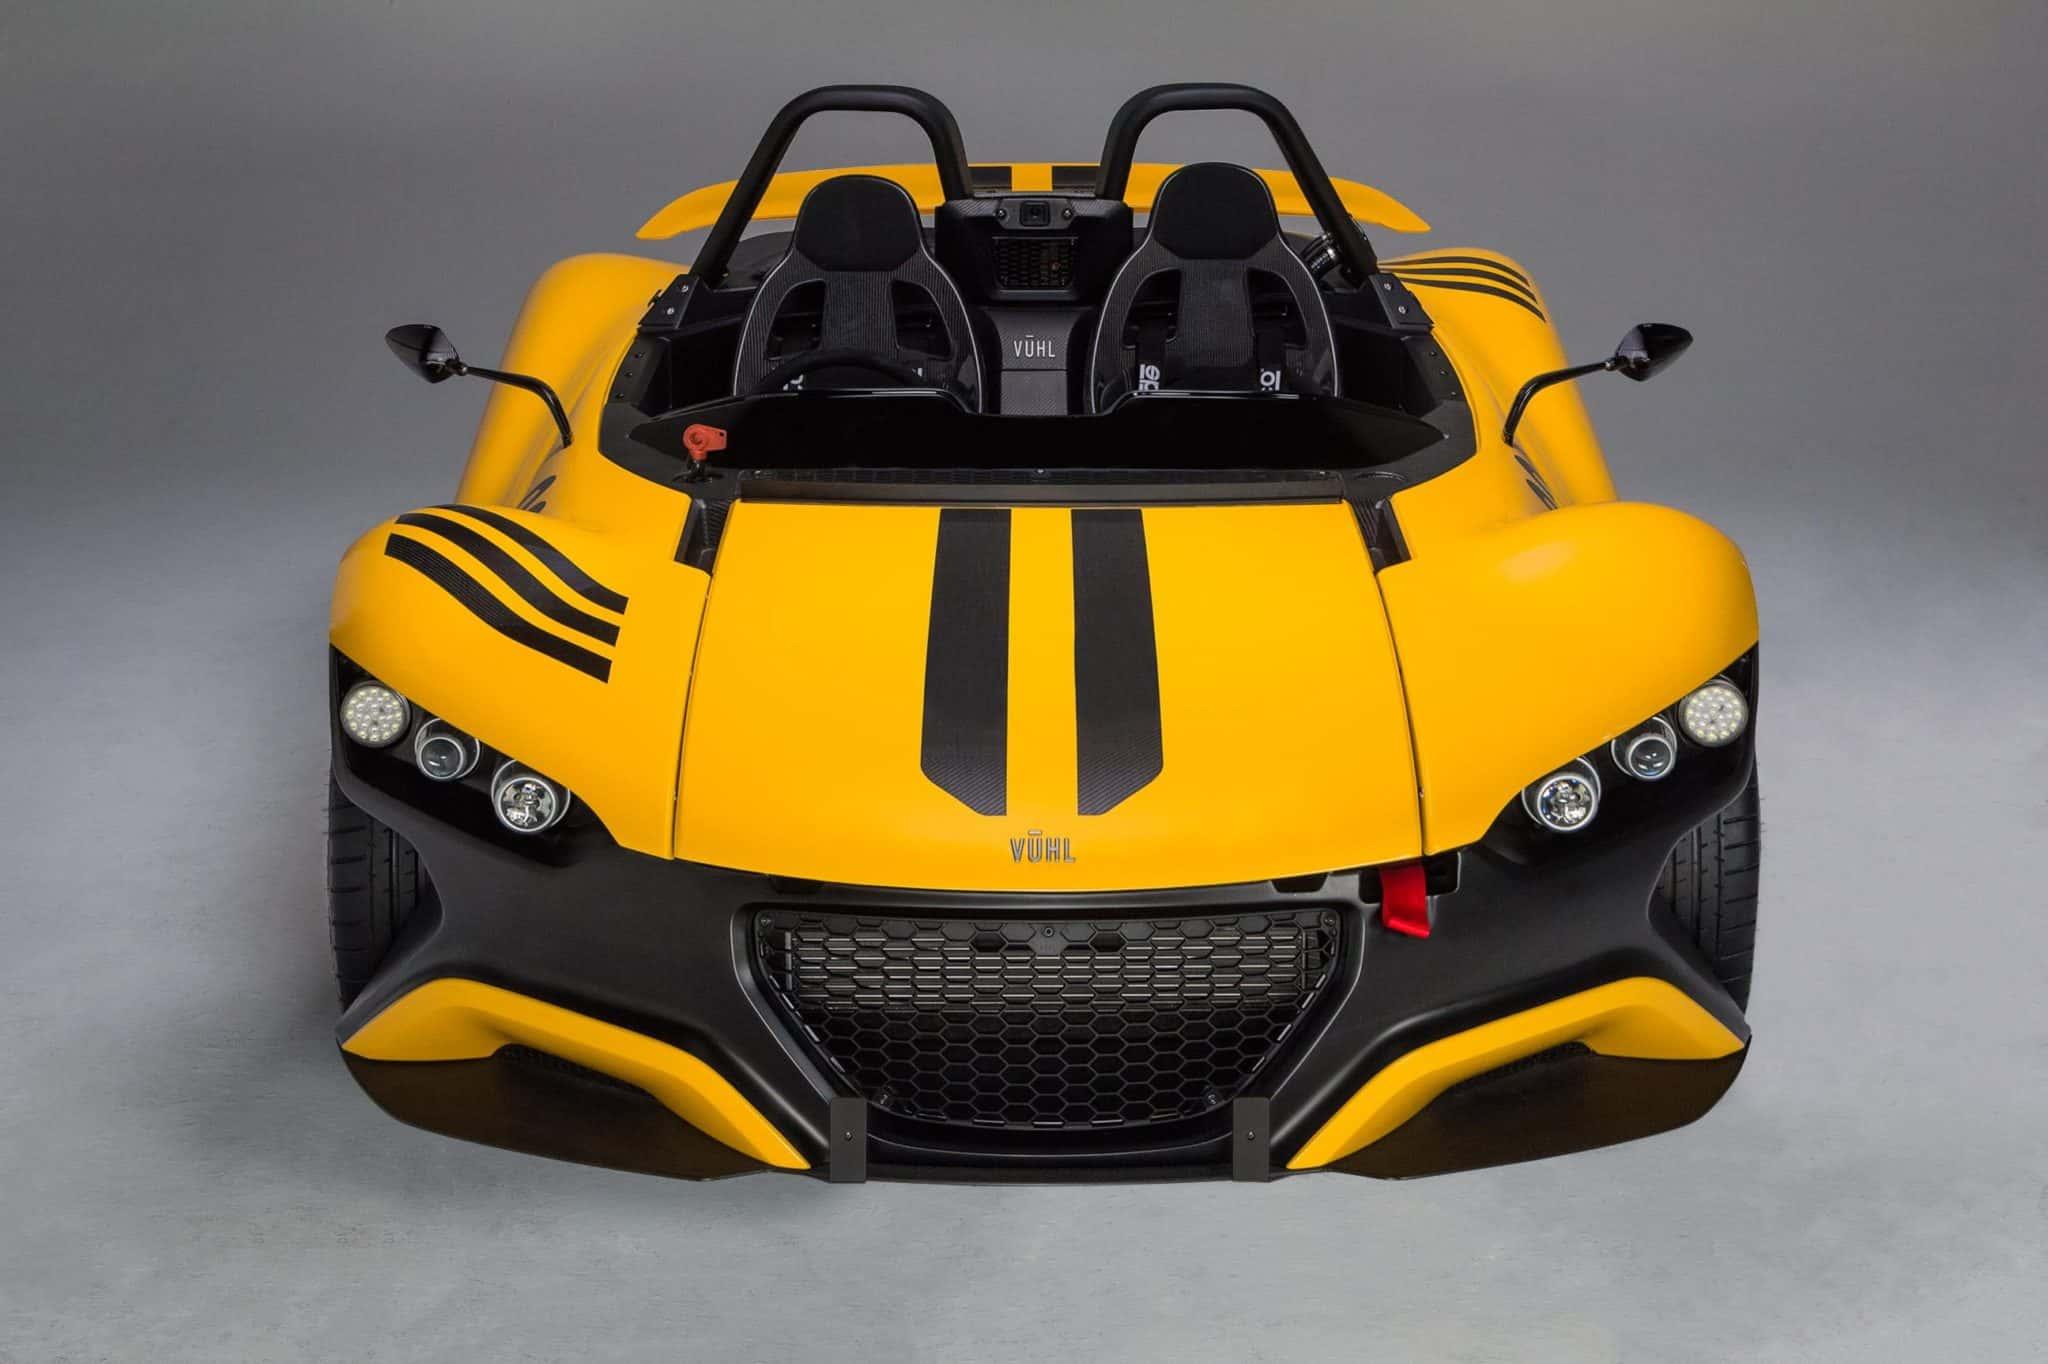 vuhl of supercar